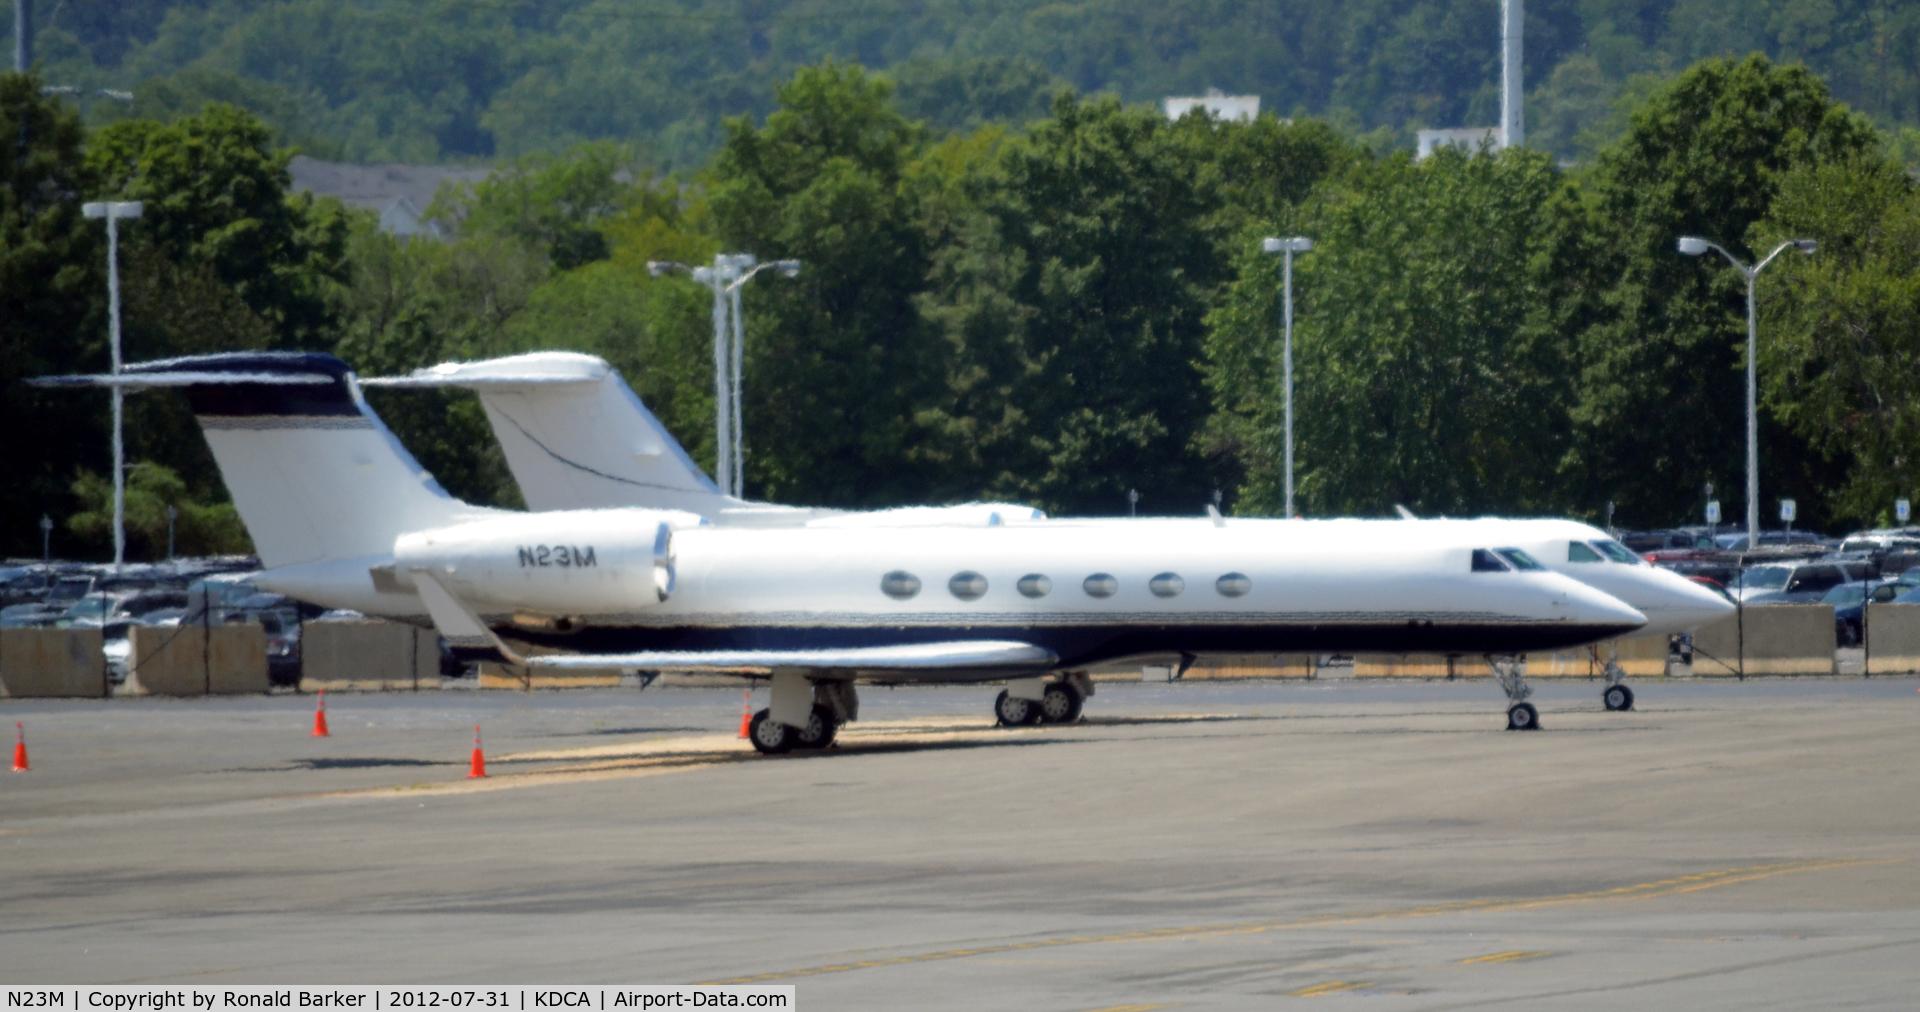 N23M, 1999 Gulfstream Aerospace G-V C/N 579, DCA VA